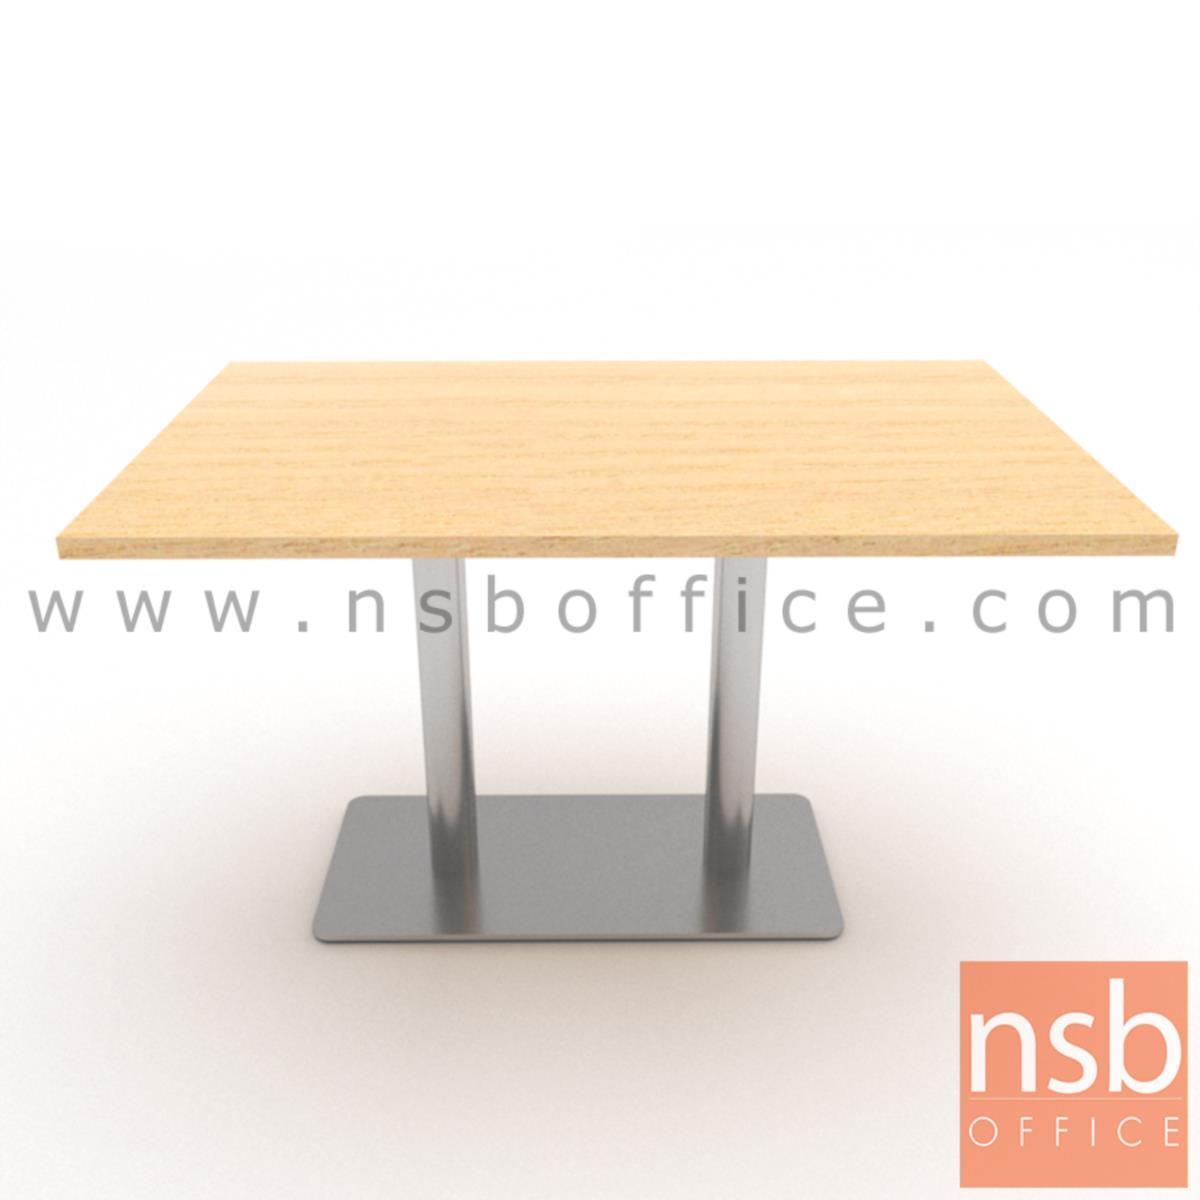 A14A272:โต๊ะบาร์ COFFEE รุ่น Ceres (ซีรีส) ขนาด 120W cm. ขาเหล็กฐานเหลี่ยมแบนยาว